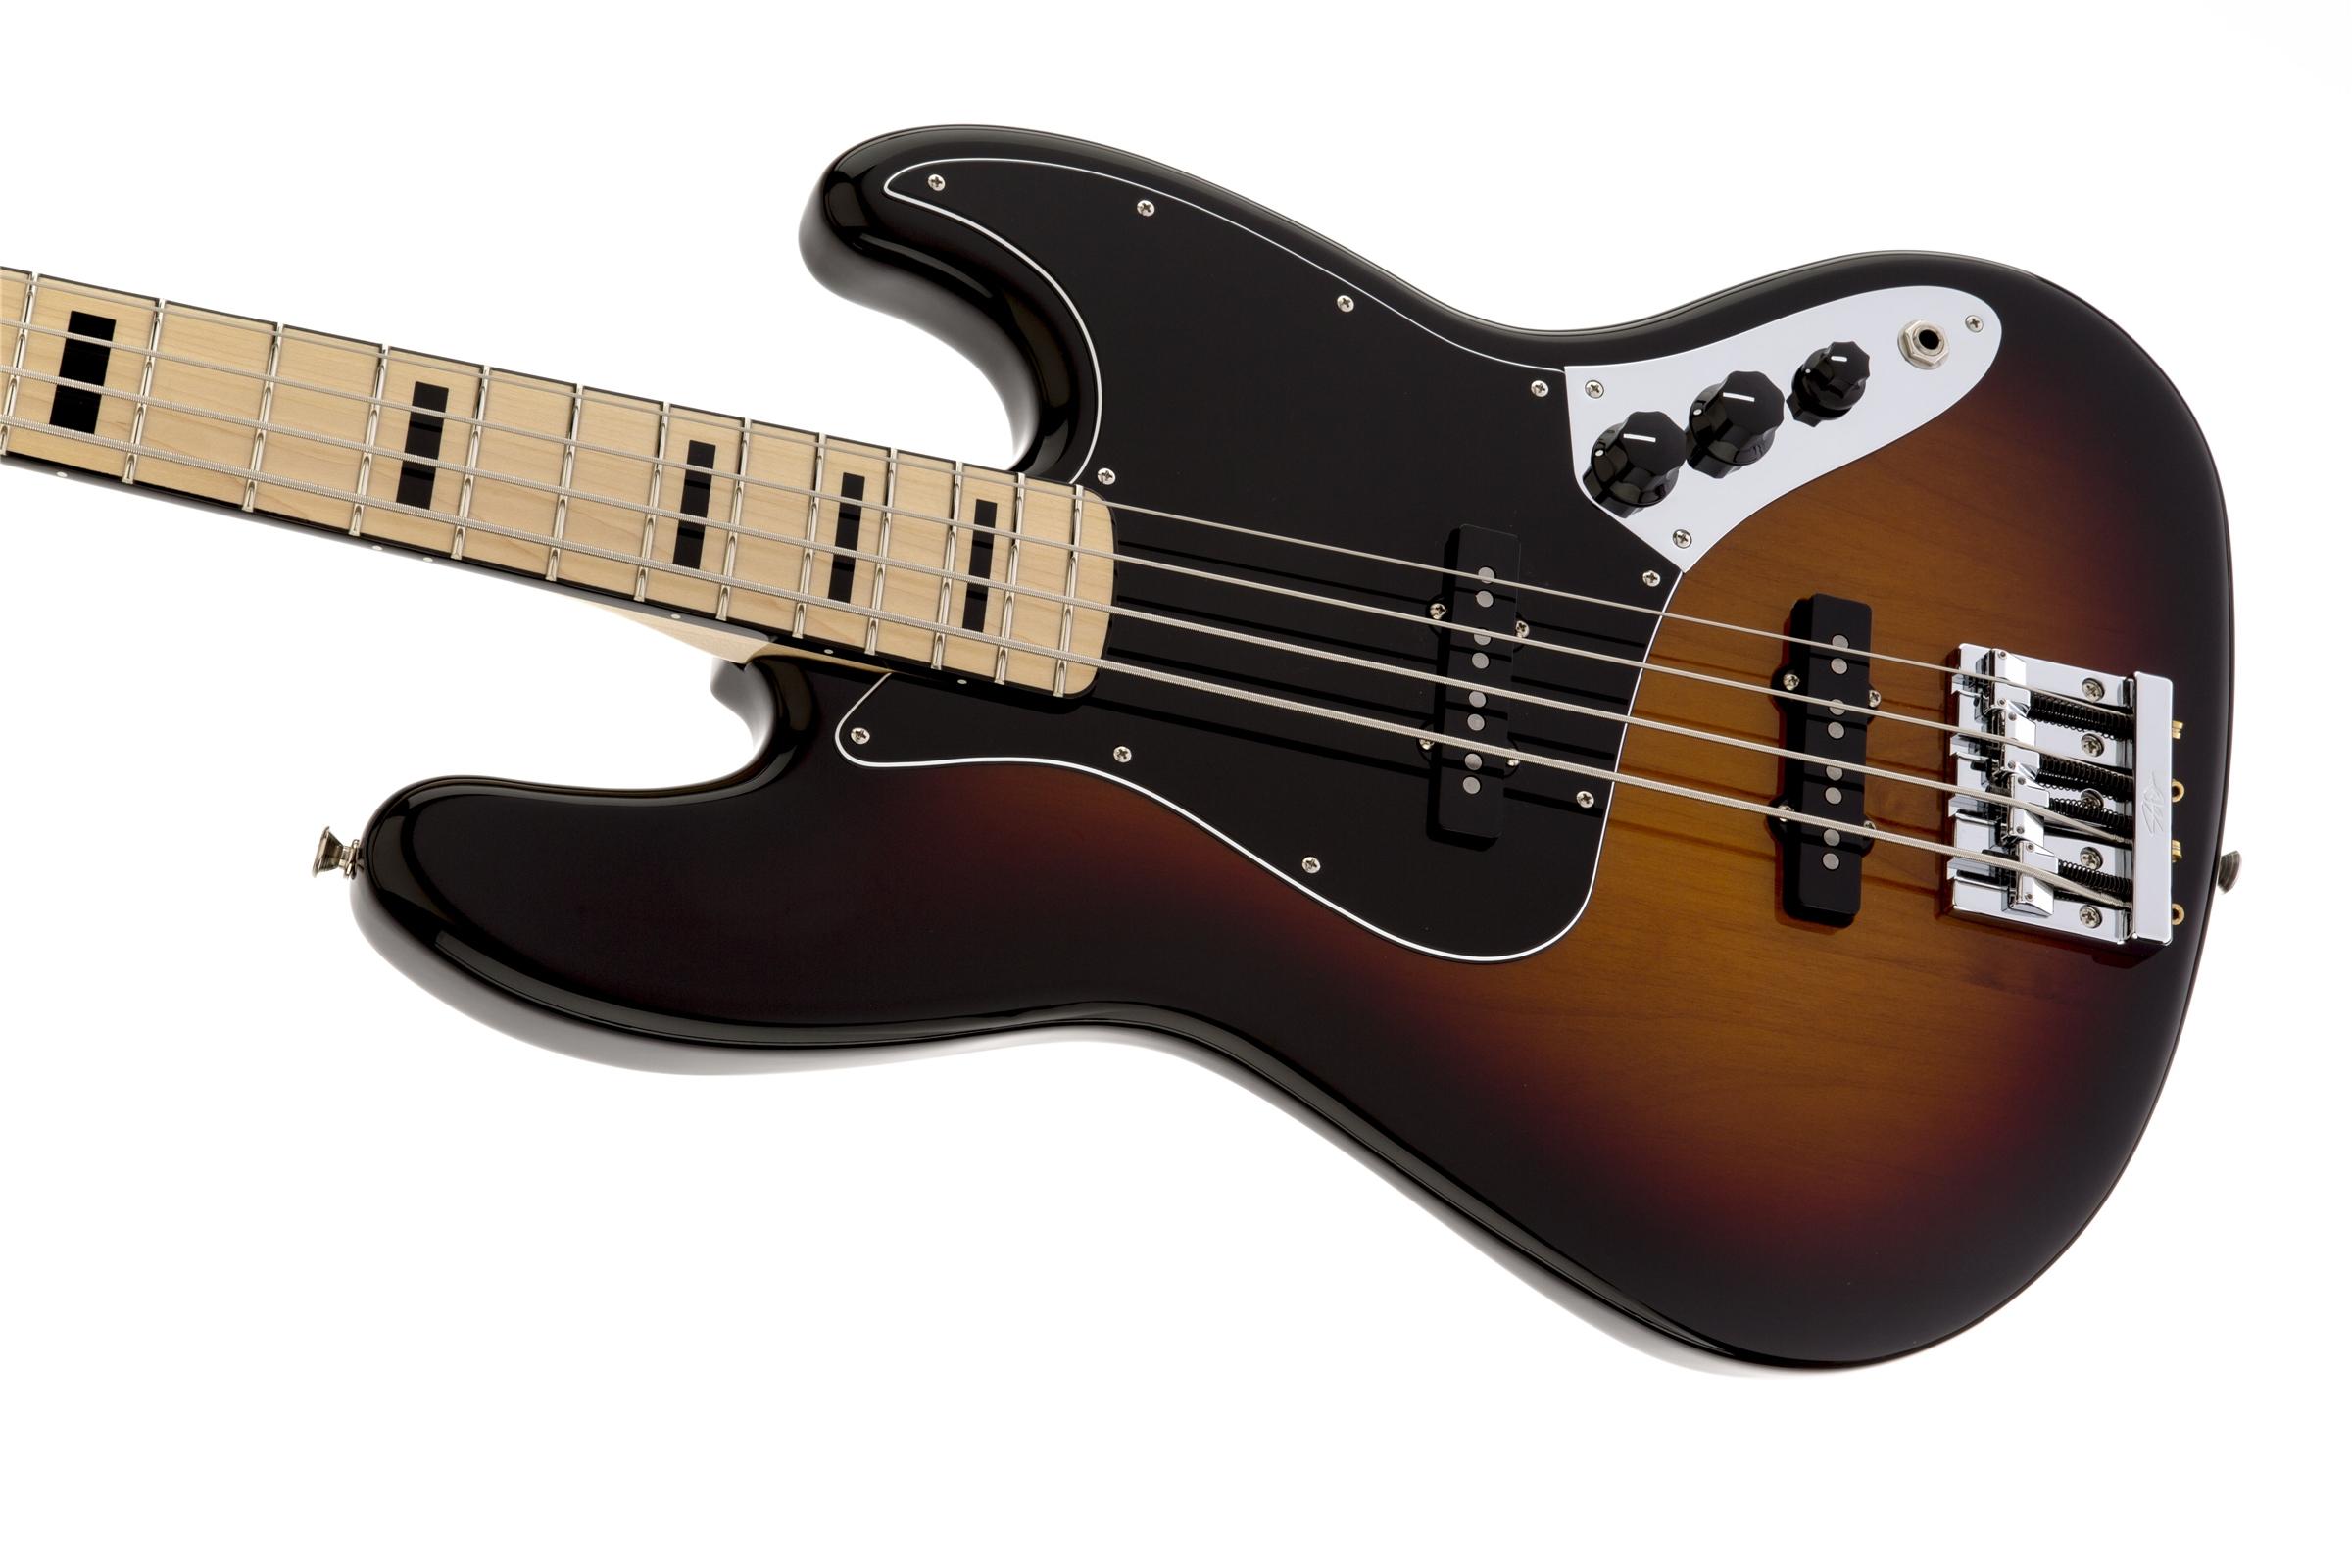 Fender Active Jazz B Wiring Diagram   Manual E-Books - Fender Jazz Bass Wiring Diagram